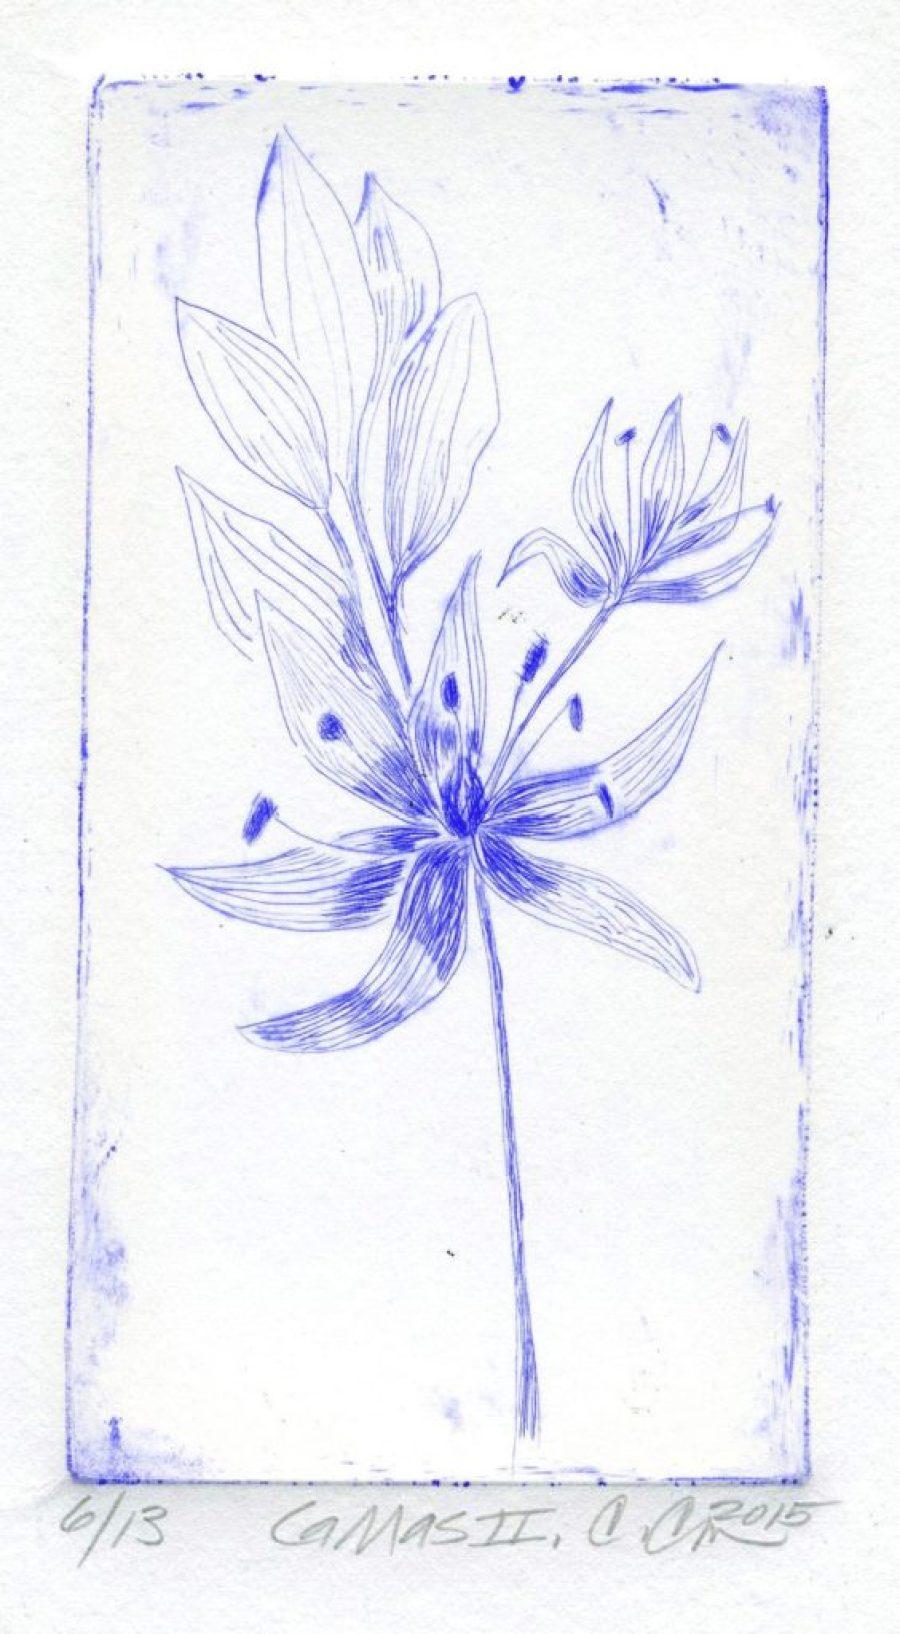 Carol Chapel, <em>CaMas001</em>, made with YInMn blue using DryPoint printing. Courtesy Carol Chapel.